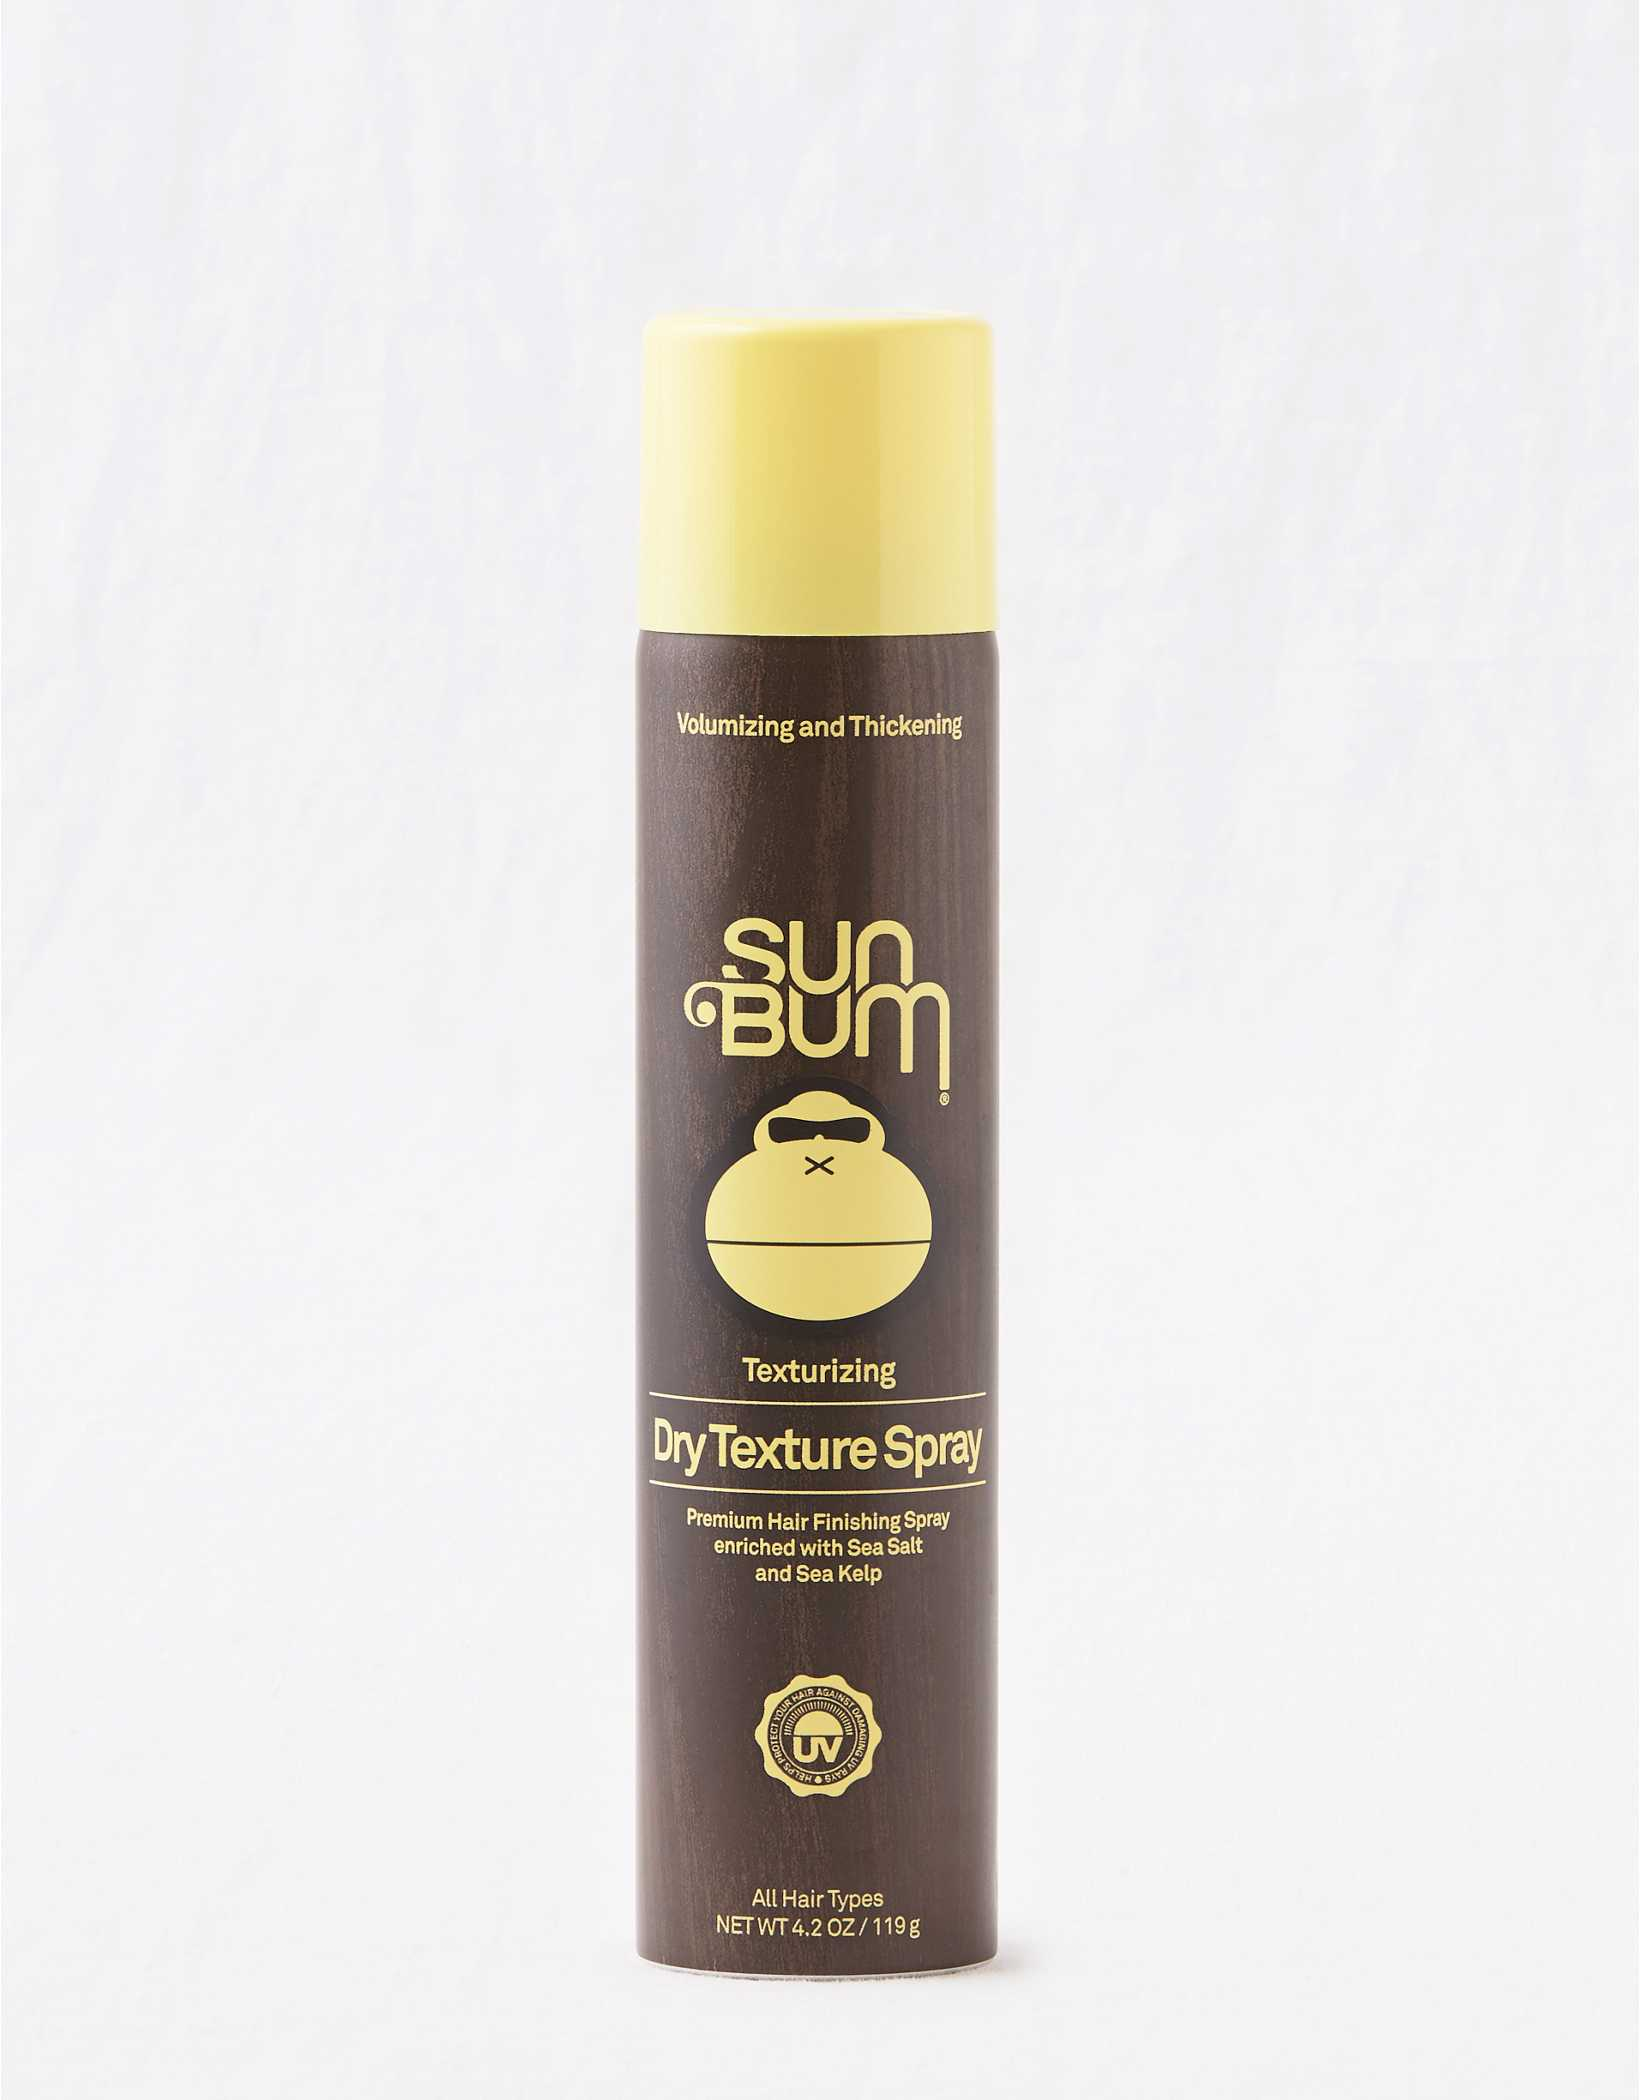 Sun Bum Dry Texture Spray